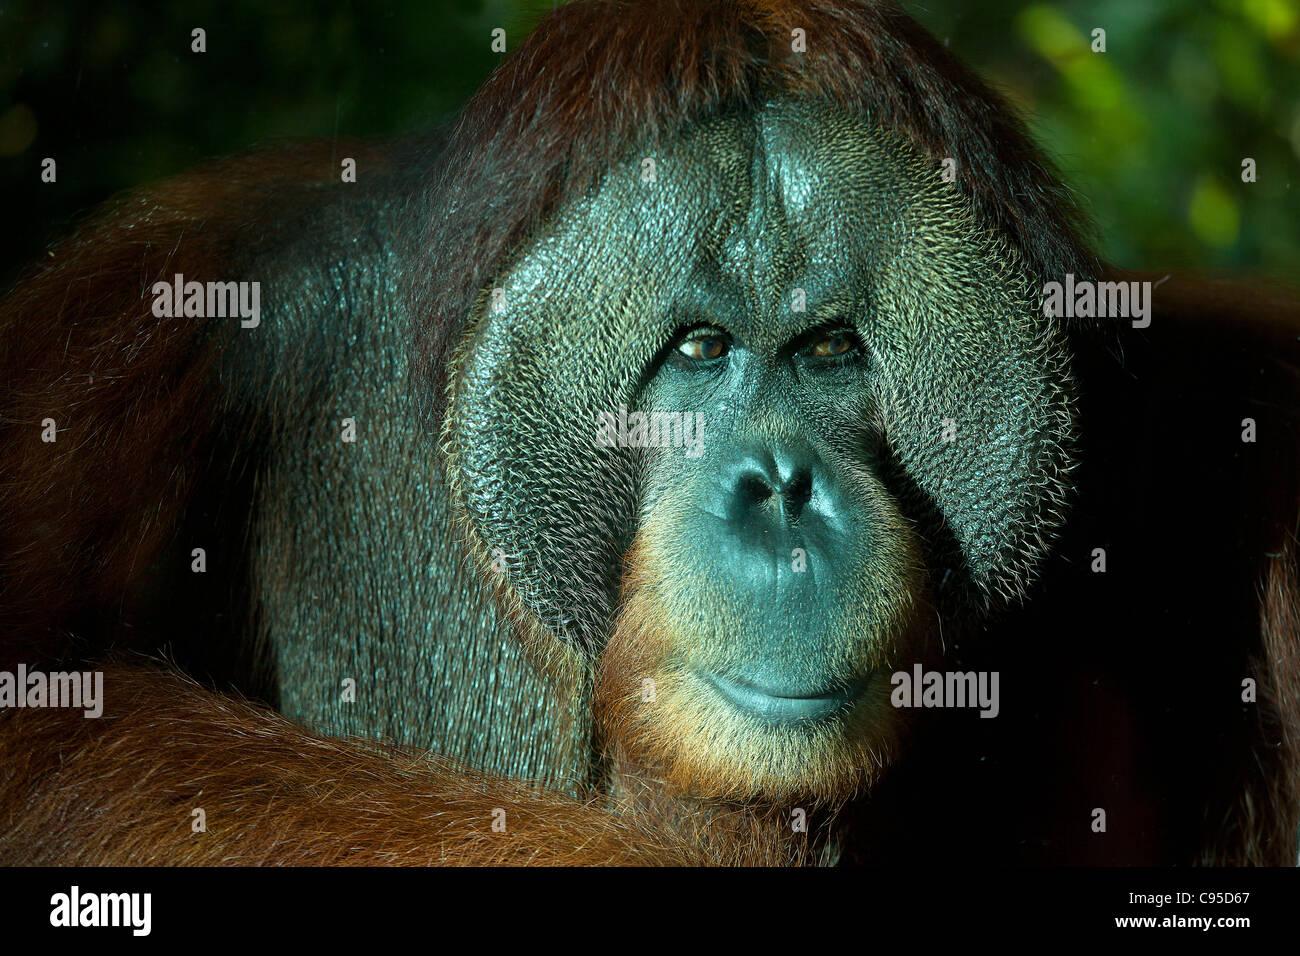 Orangutan, Singapore zoo - Stock Image